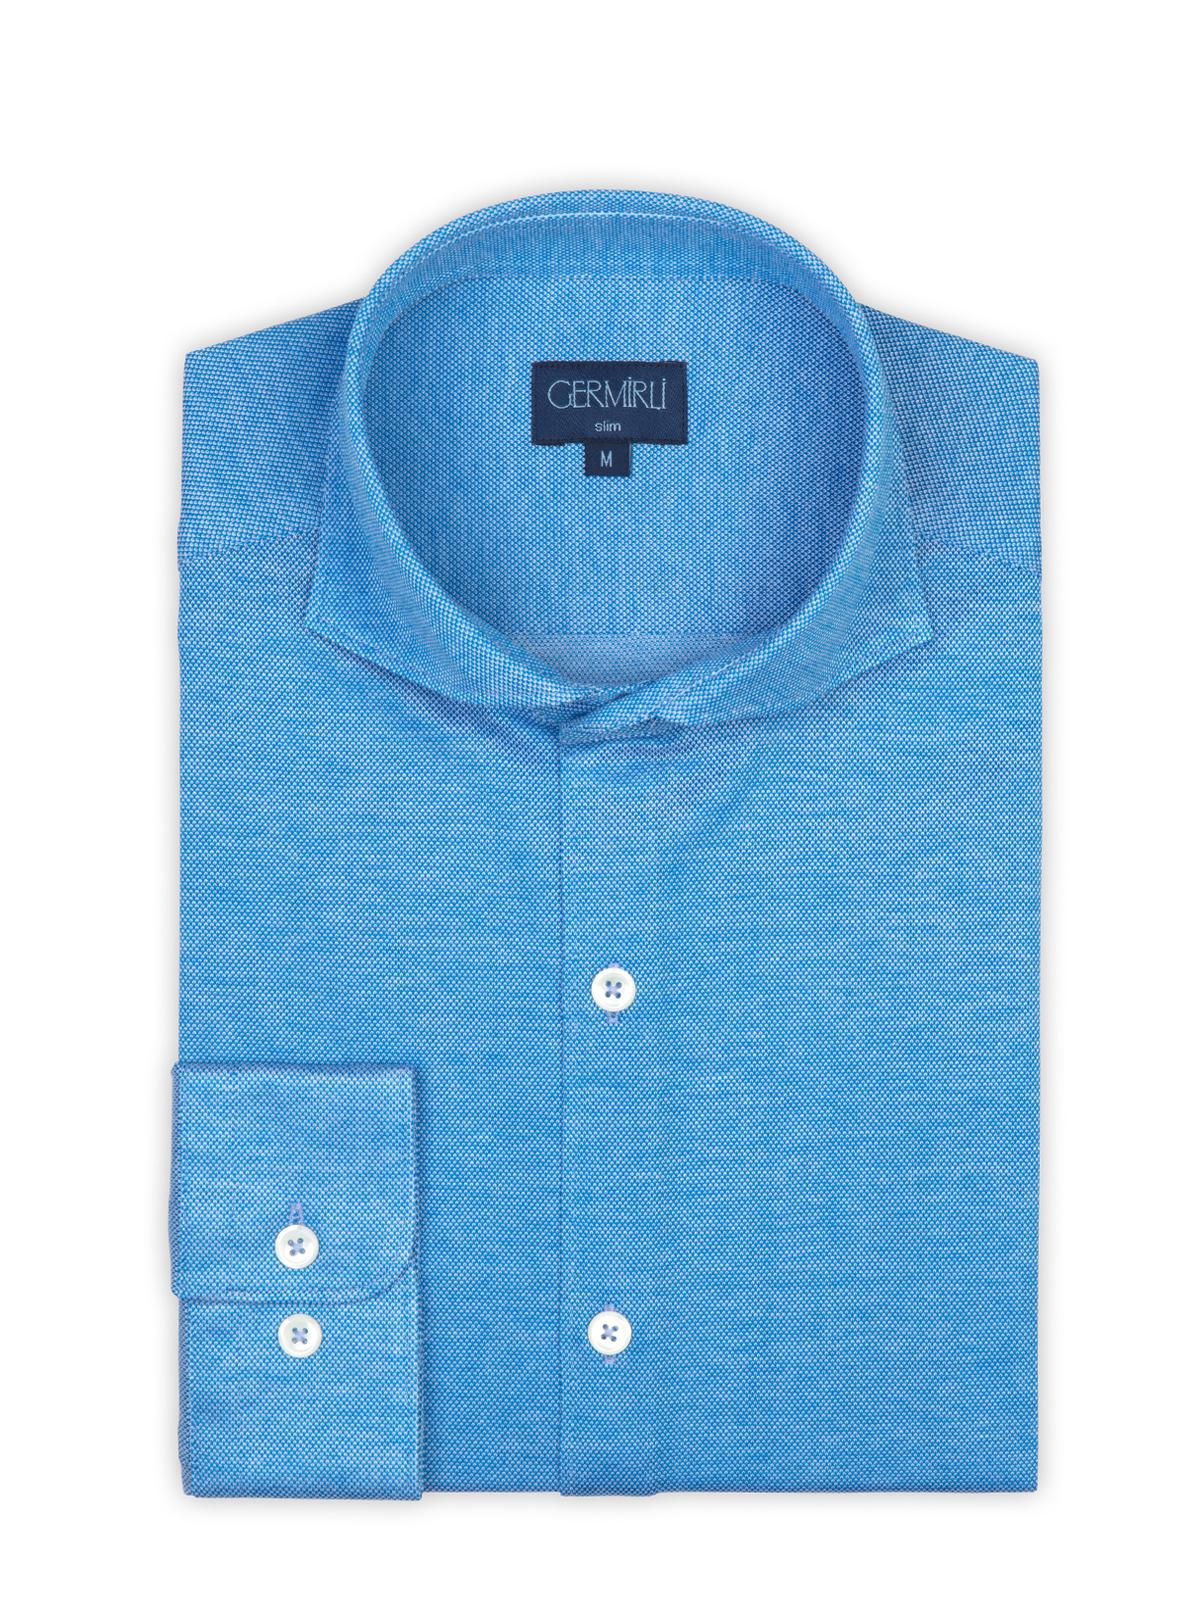 Germirli Azur Mavisi Klasik Yaka Piquet Örme Slim Fit Gömlek